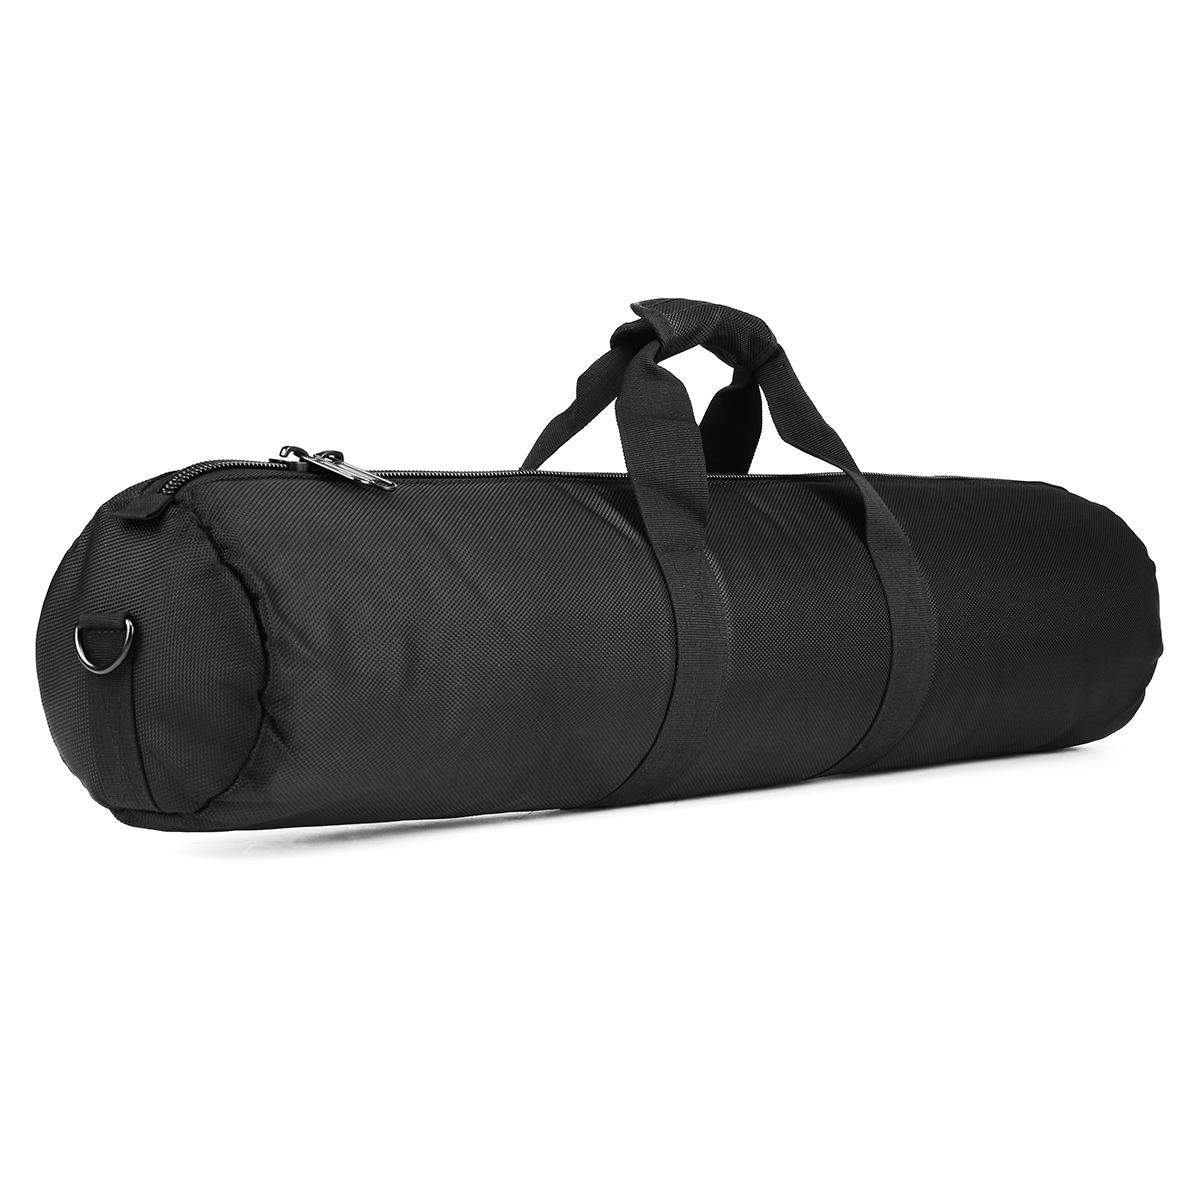 60 For Sale Ioffer Kubota F2880 Wiring Diagram 60cm Padded Strap Camera Tripod Carry Waterproof Bag Ca